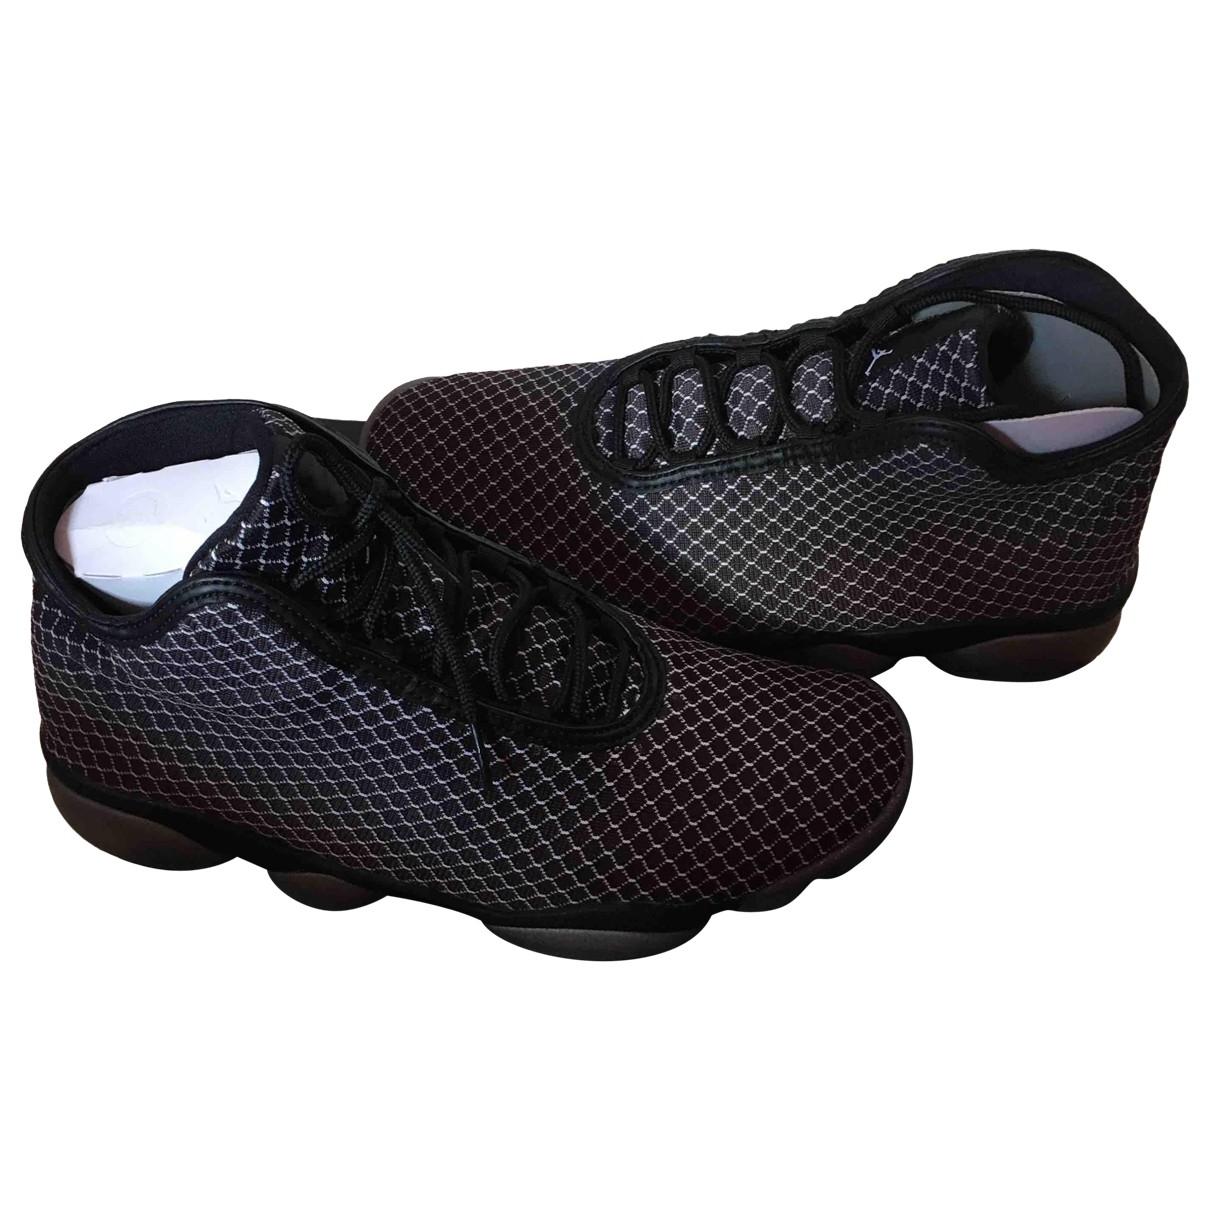 Jordan \N Sneakers in  Weiss Leinen